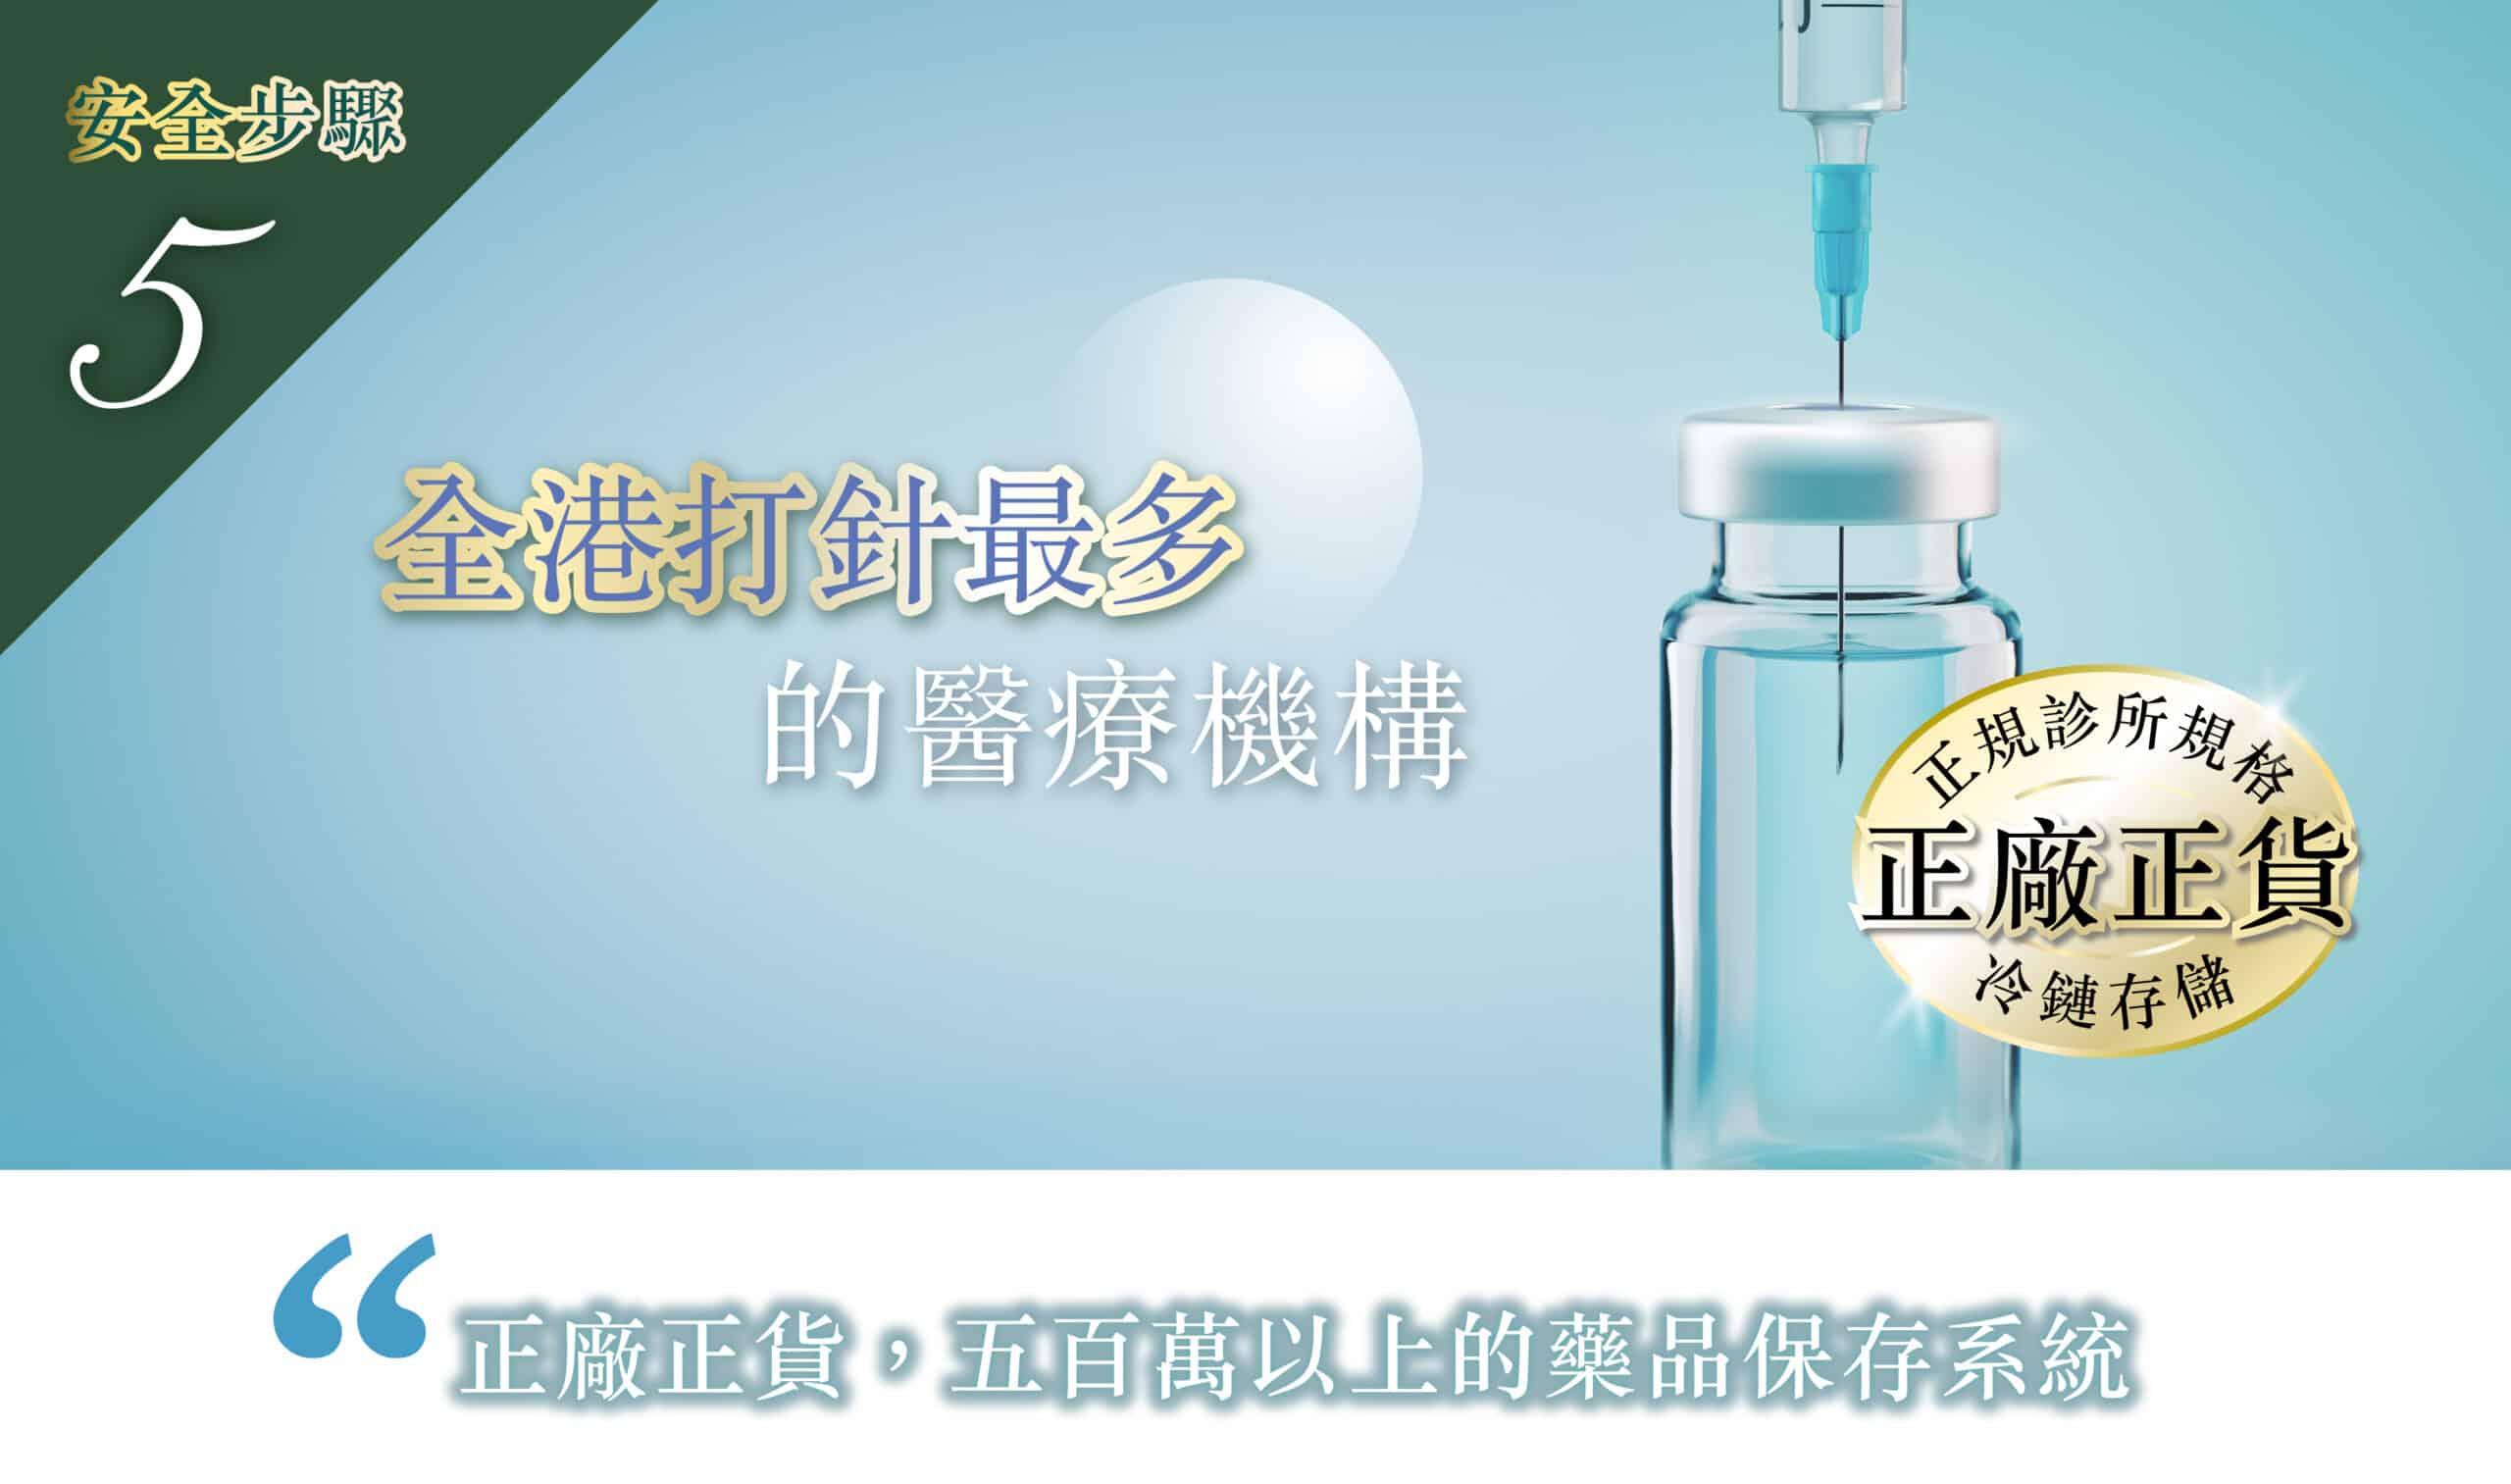 Restylane水光針 法令紋 22n scaled